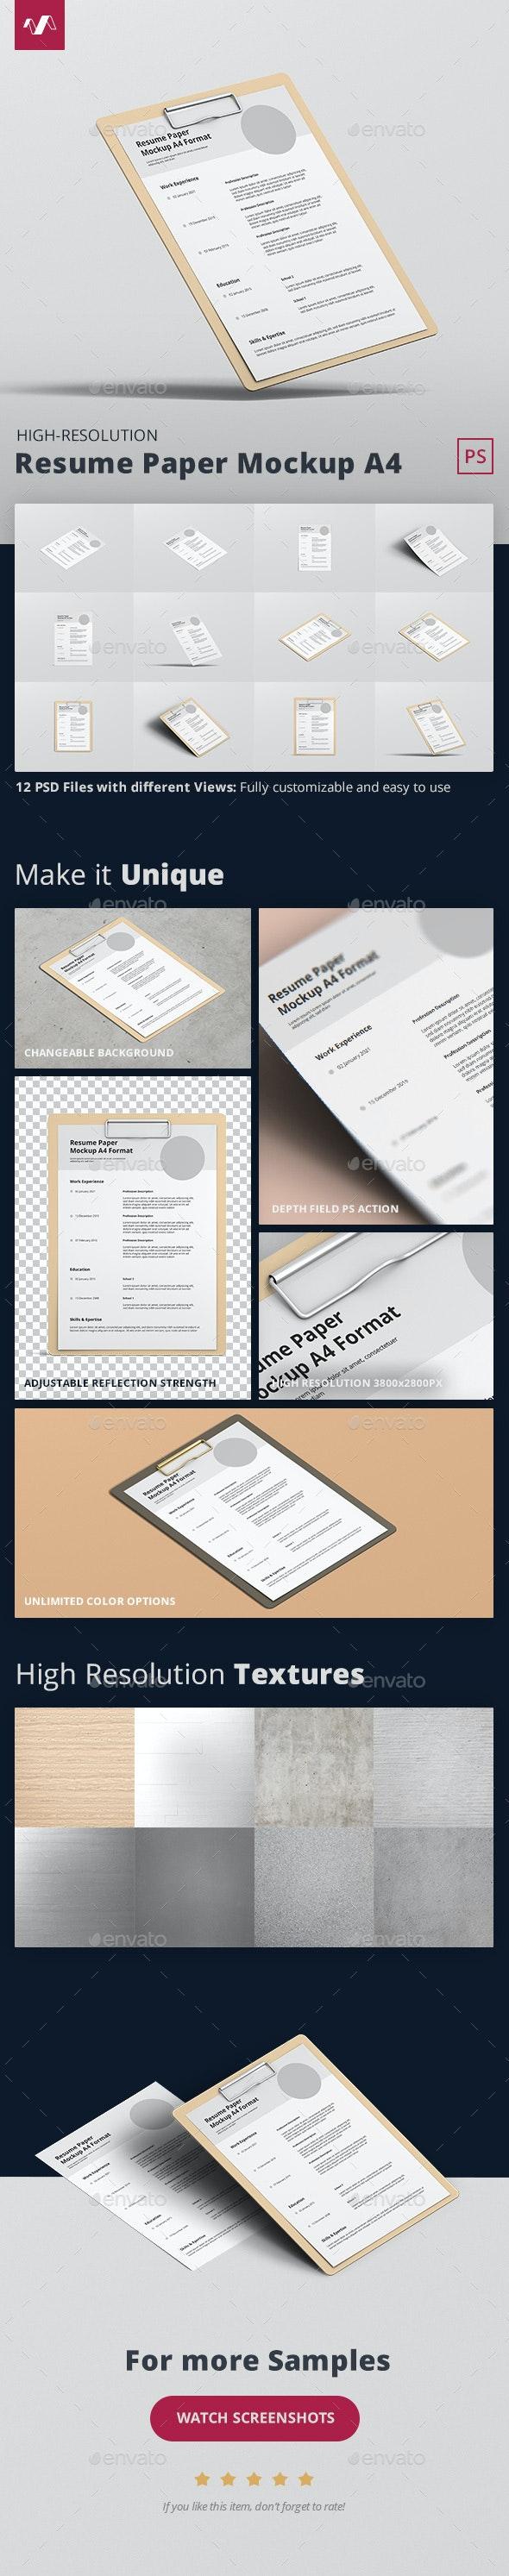 Resume Paper Mockup A4 - Stationery Print